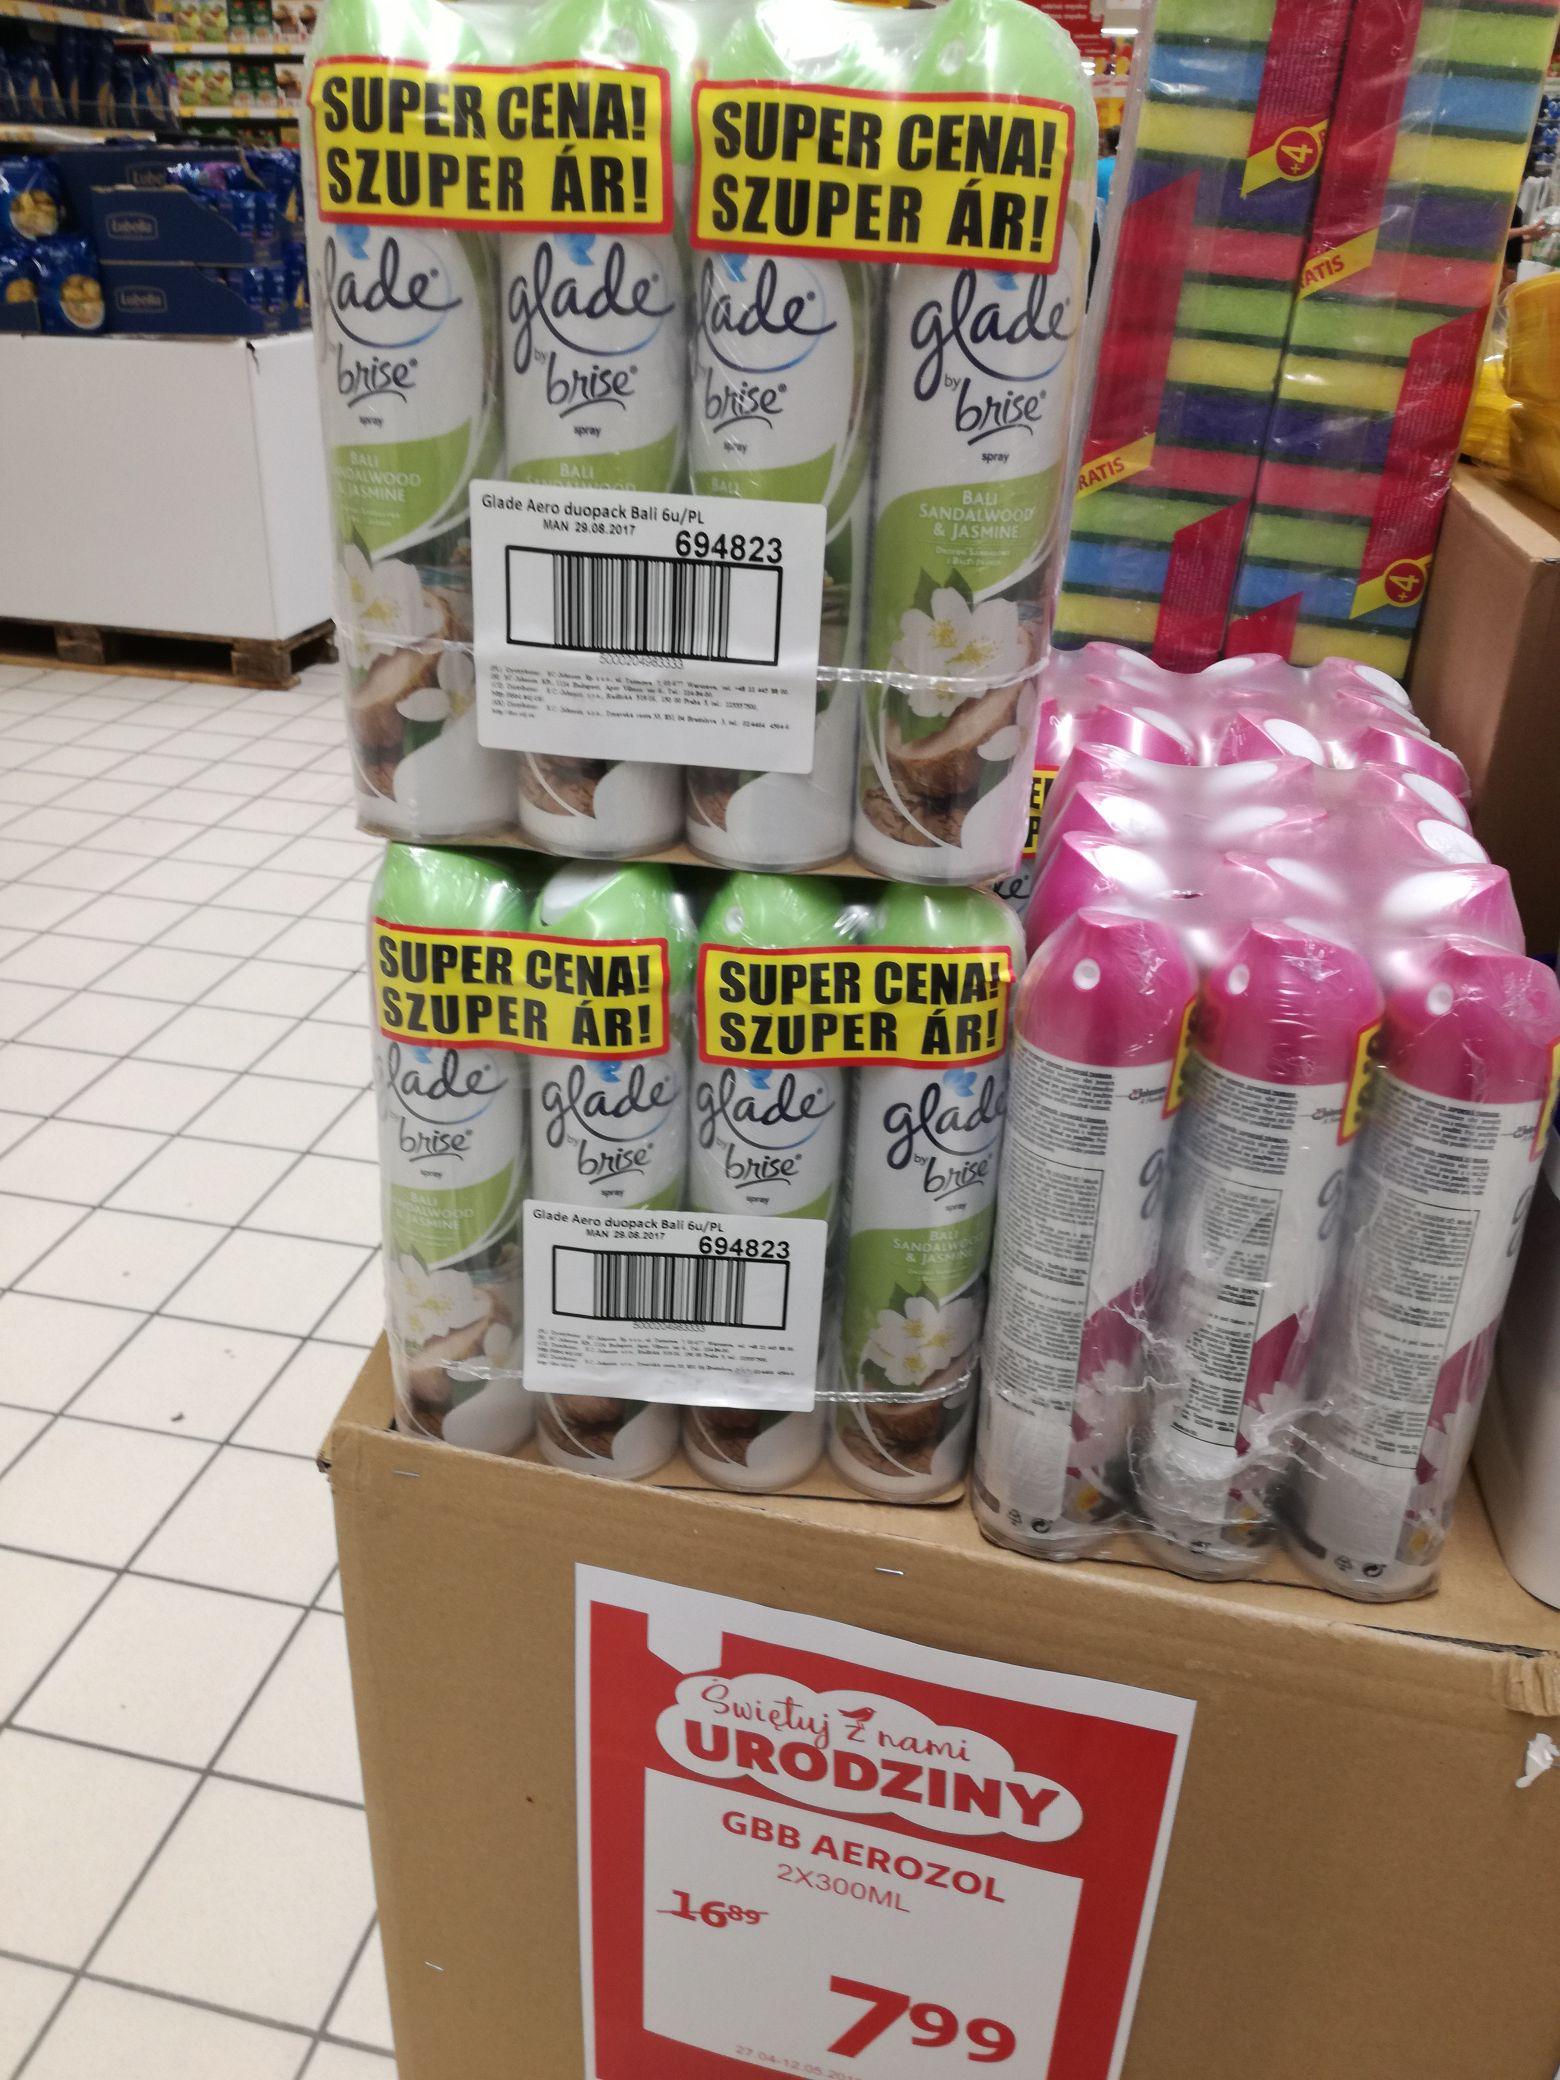 Dwupak Brise Glade Auchan